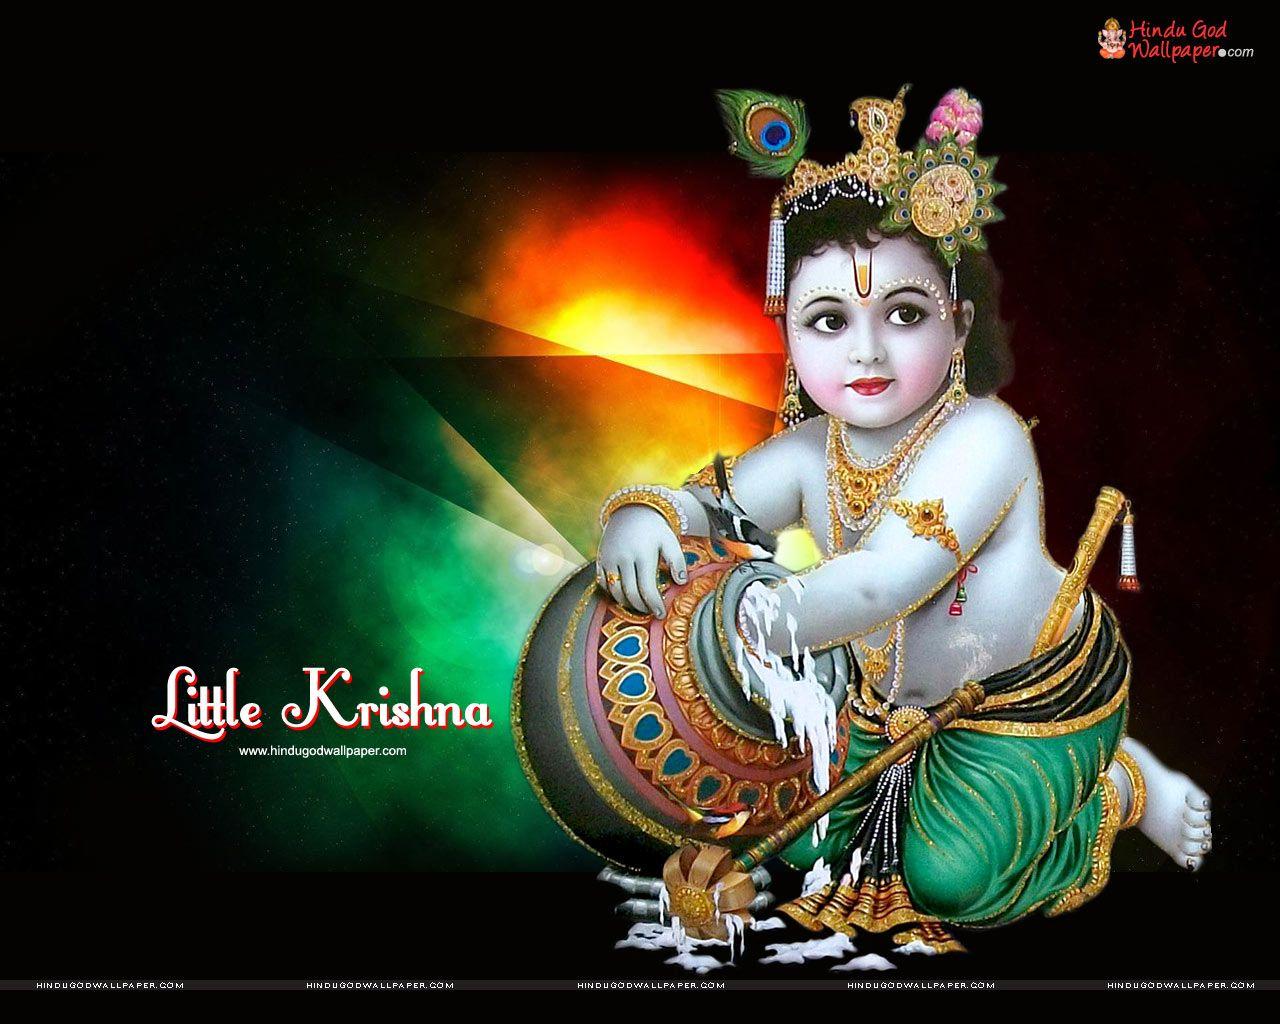 Lord shree bal krishna wallpaper beautiful hd wallpaper - Search Results For Bal Krishna Wallpaper For Desktop Adorable Wallpapers